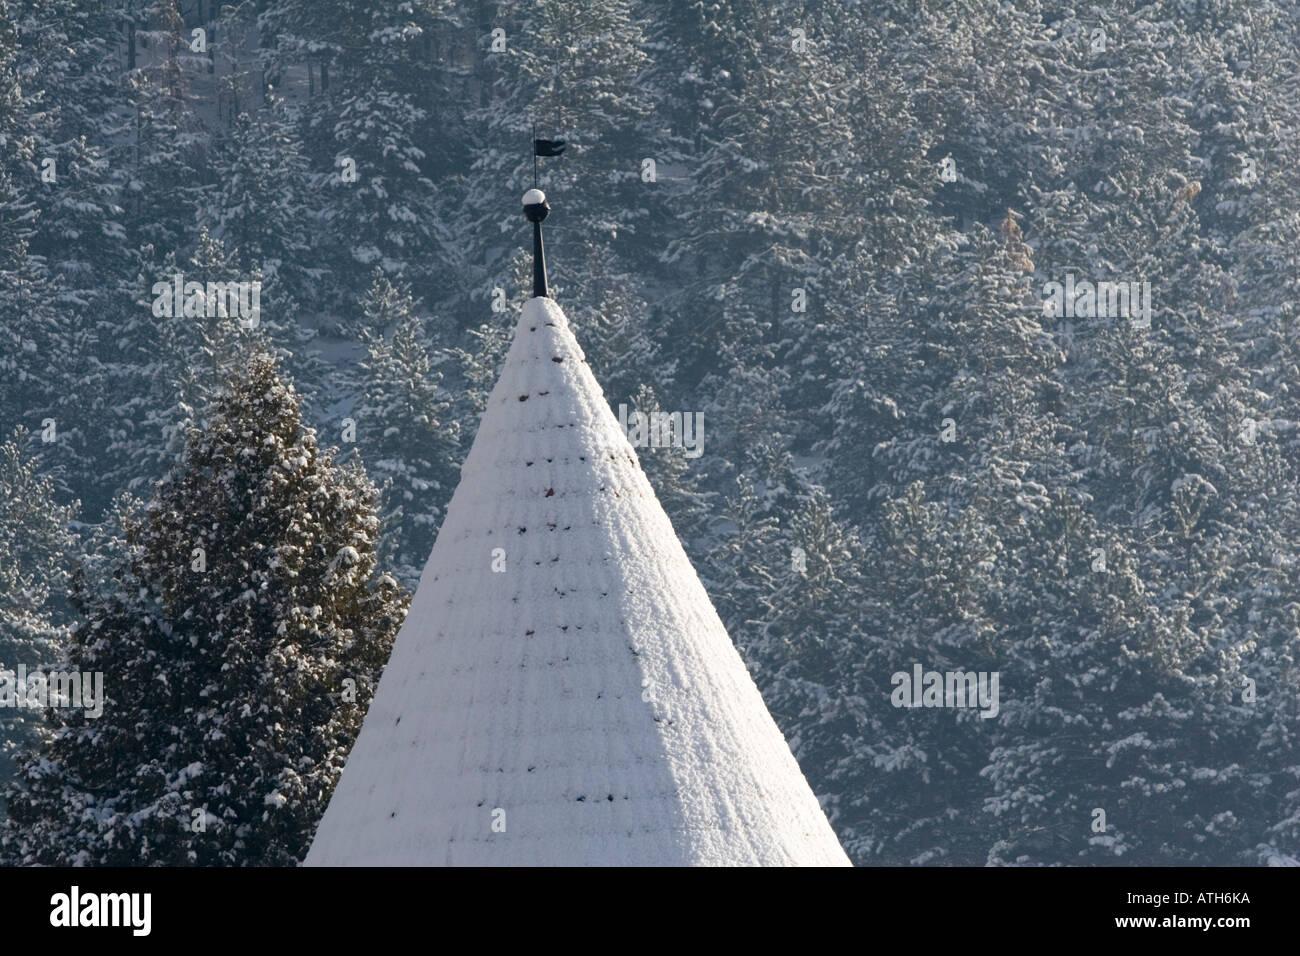 Castle turret coverd in snow Stock Photo